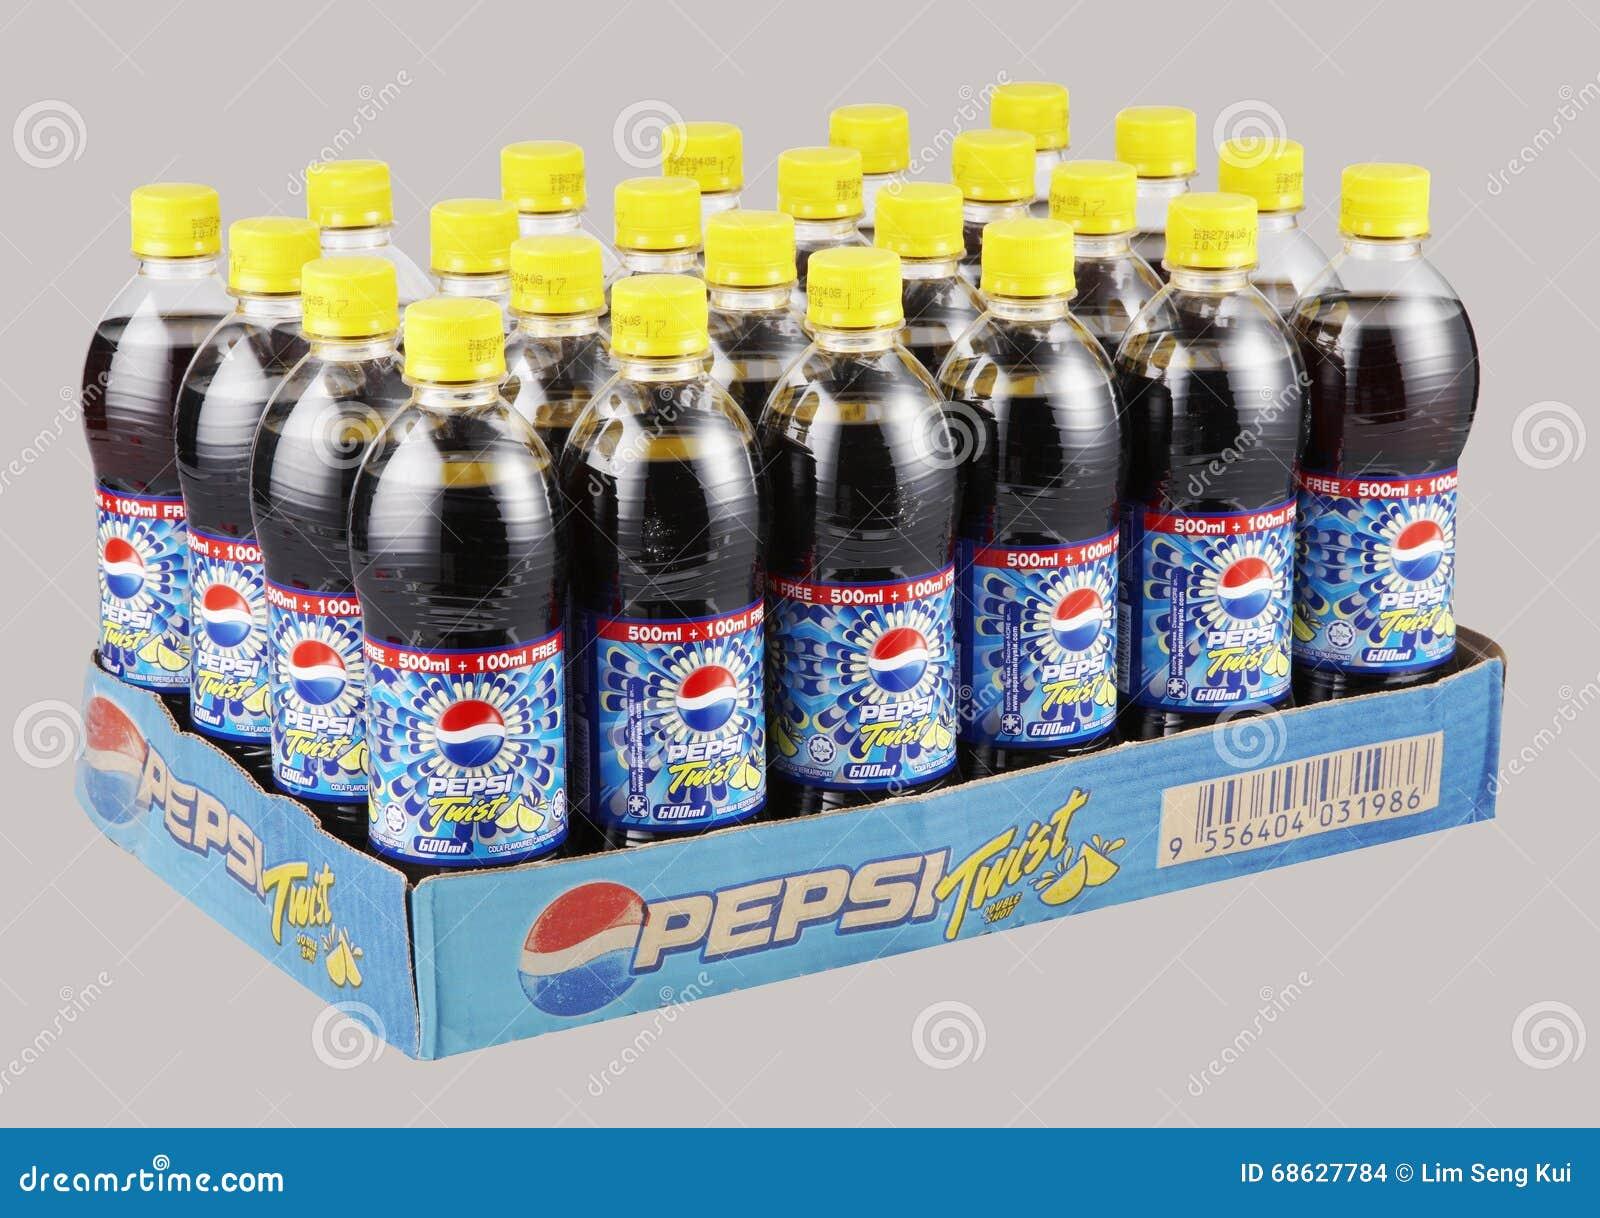 Pepsi editorial stock image  Image of bottle, caffeine